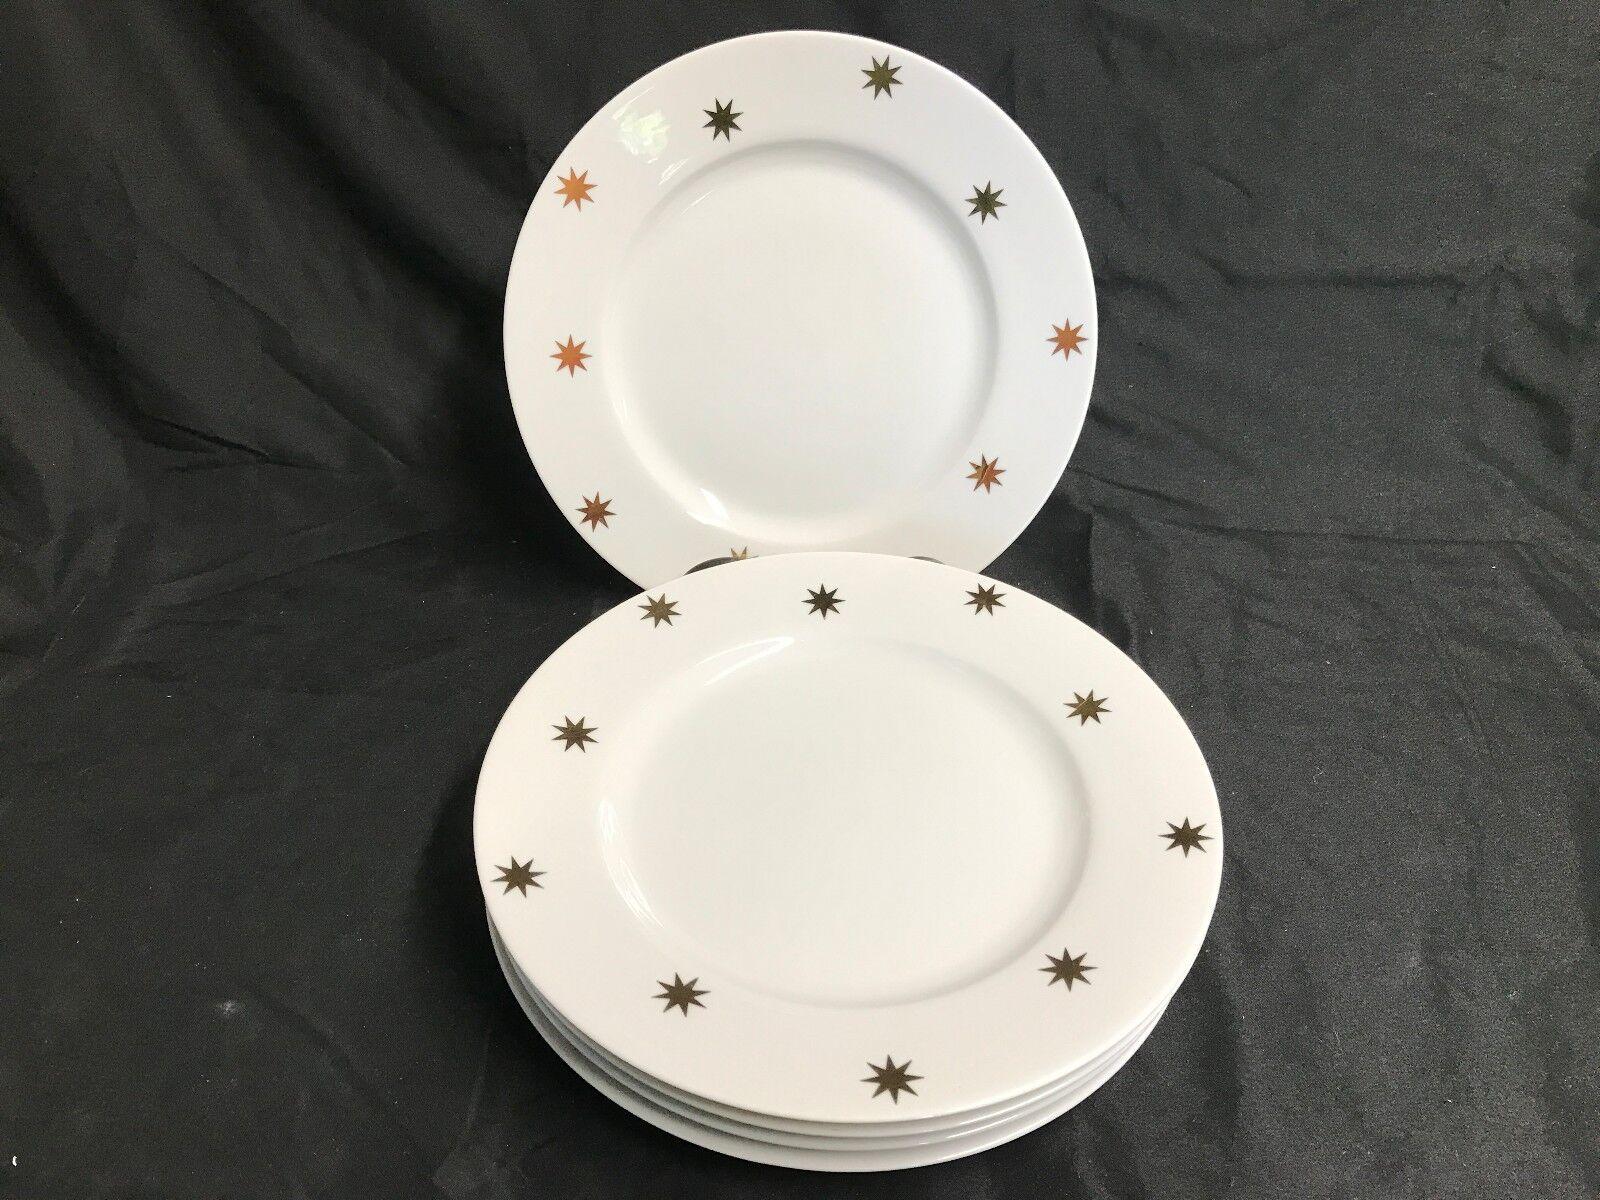 Pier 1   Gold STARS   on Weiß  Set of 5  Dinner Plates  10 1 2